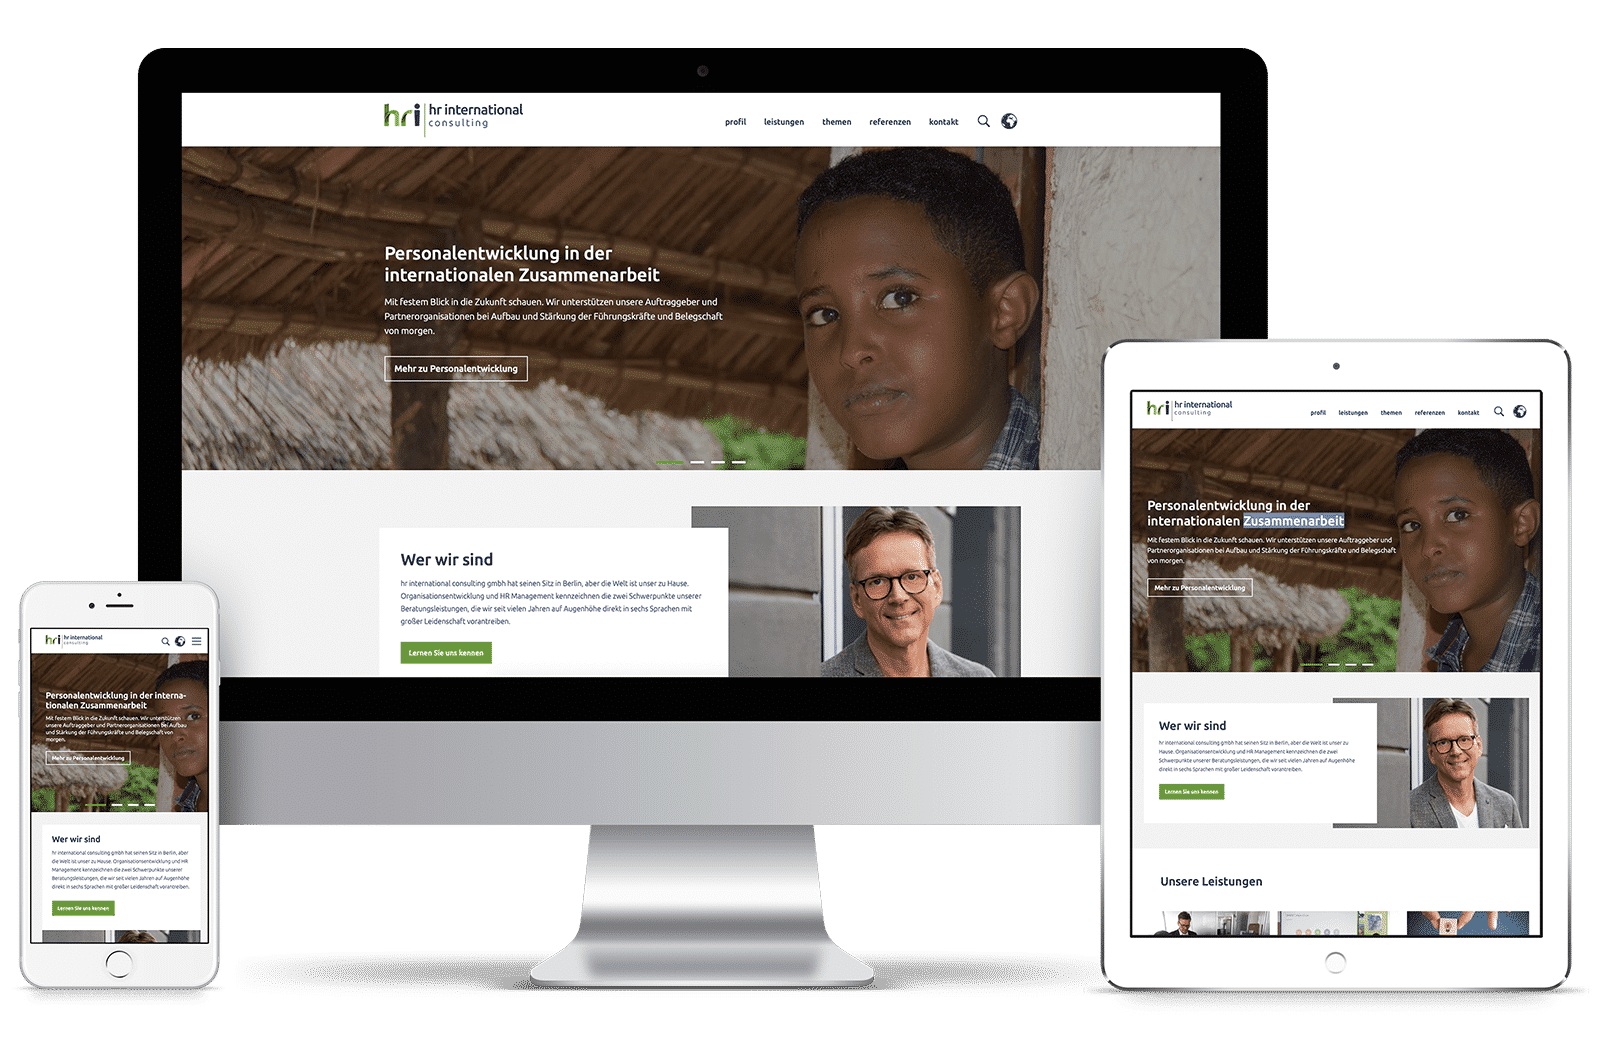 webdesign_hri-berlin_mockup